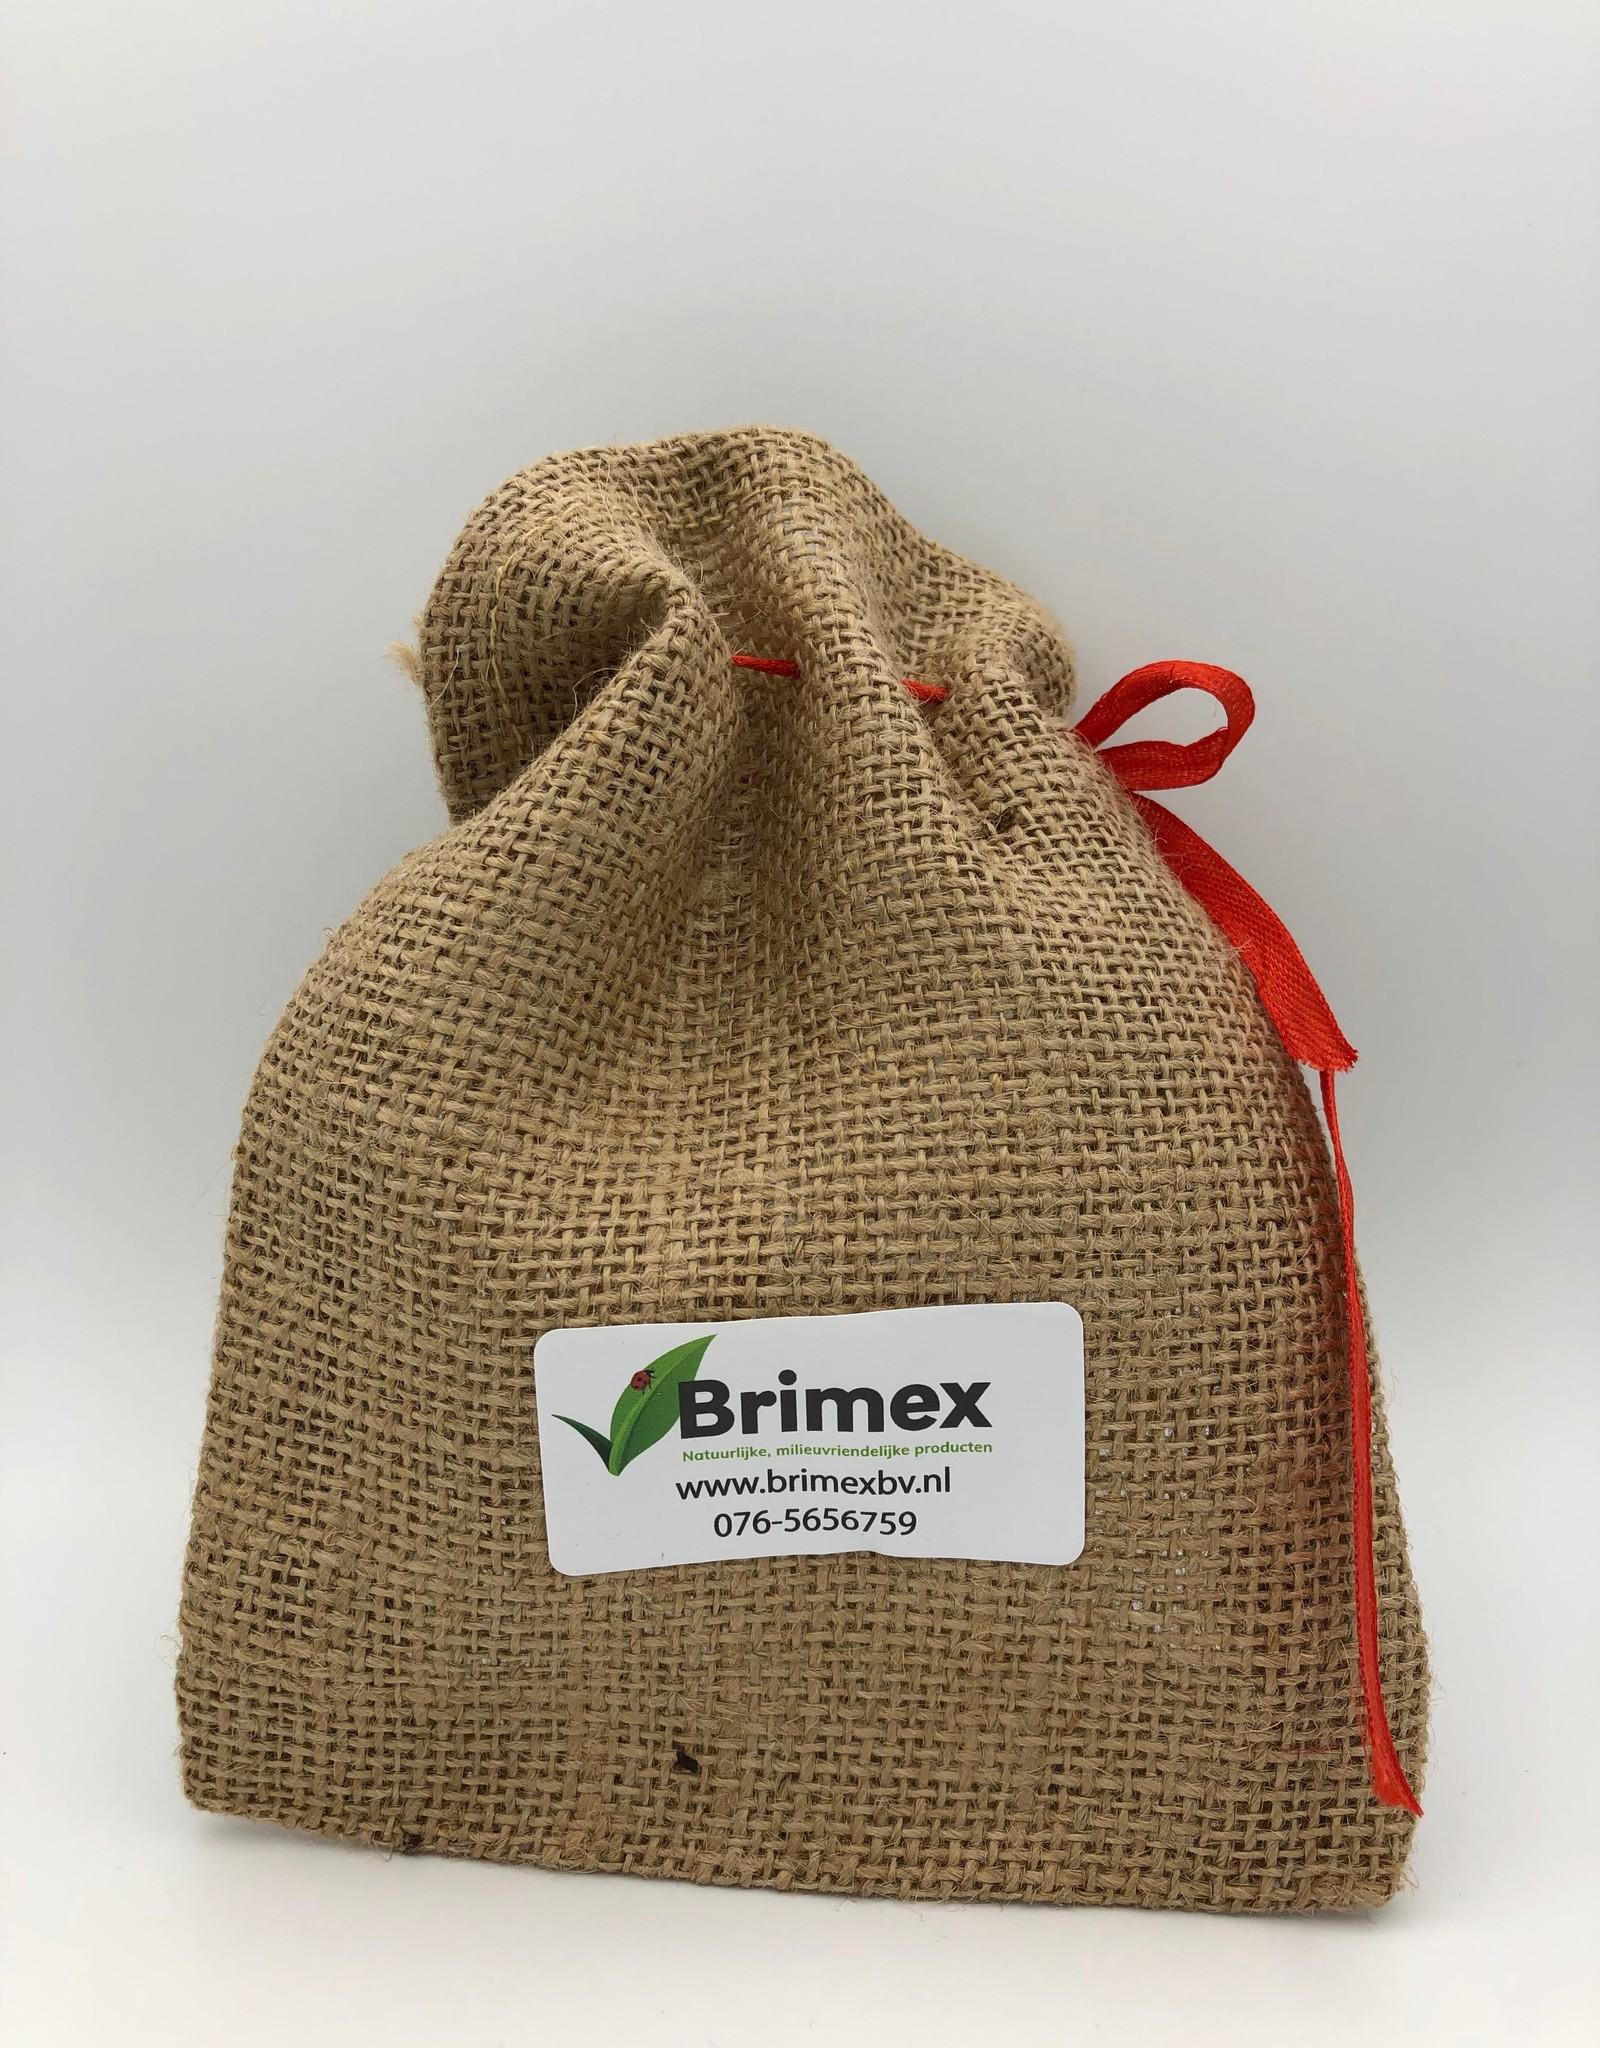 Brimex Biobest Lieveheersbeestje Adalia  bipunctata system